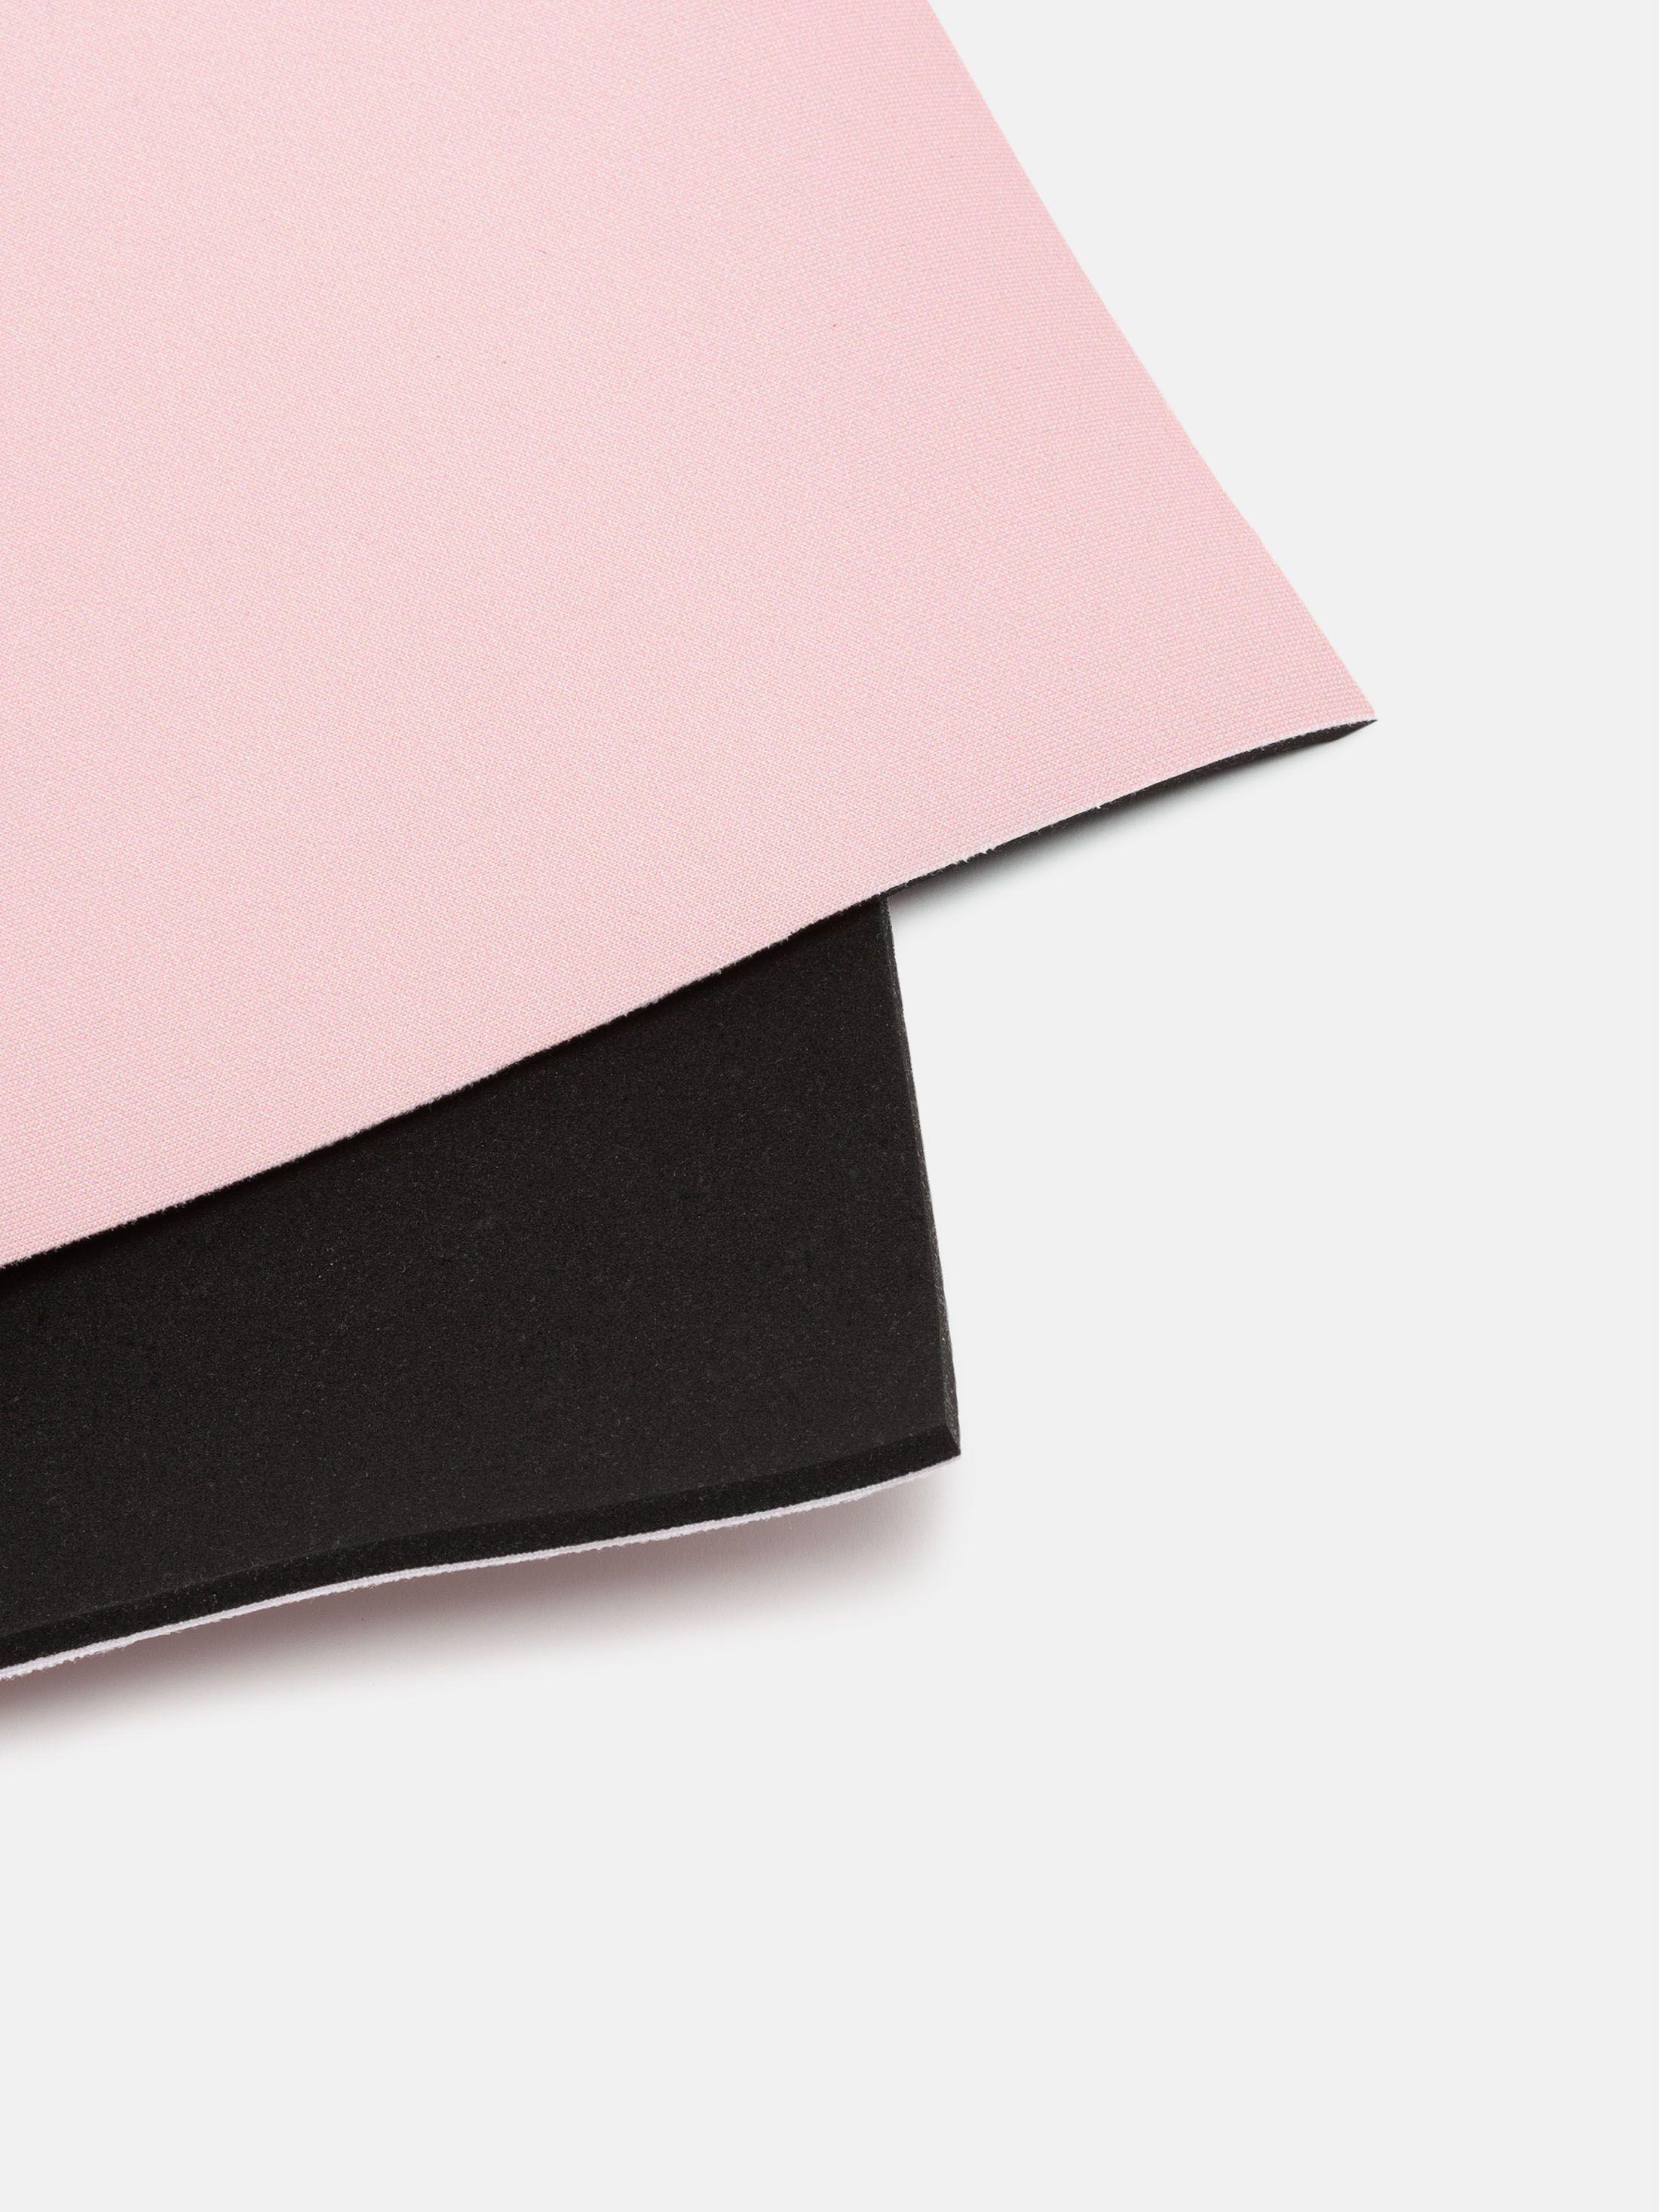 custom desk pad UK